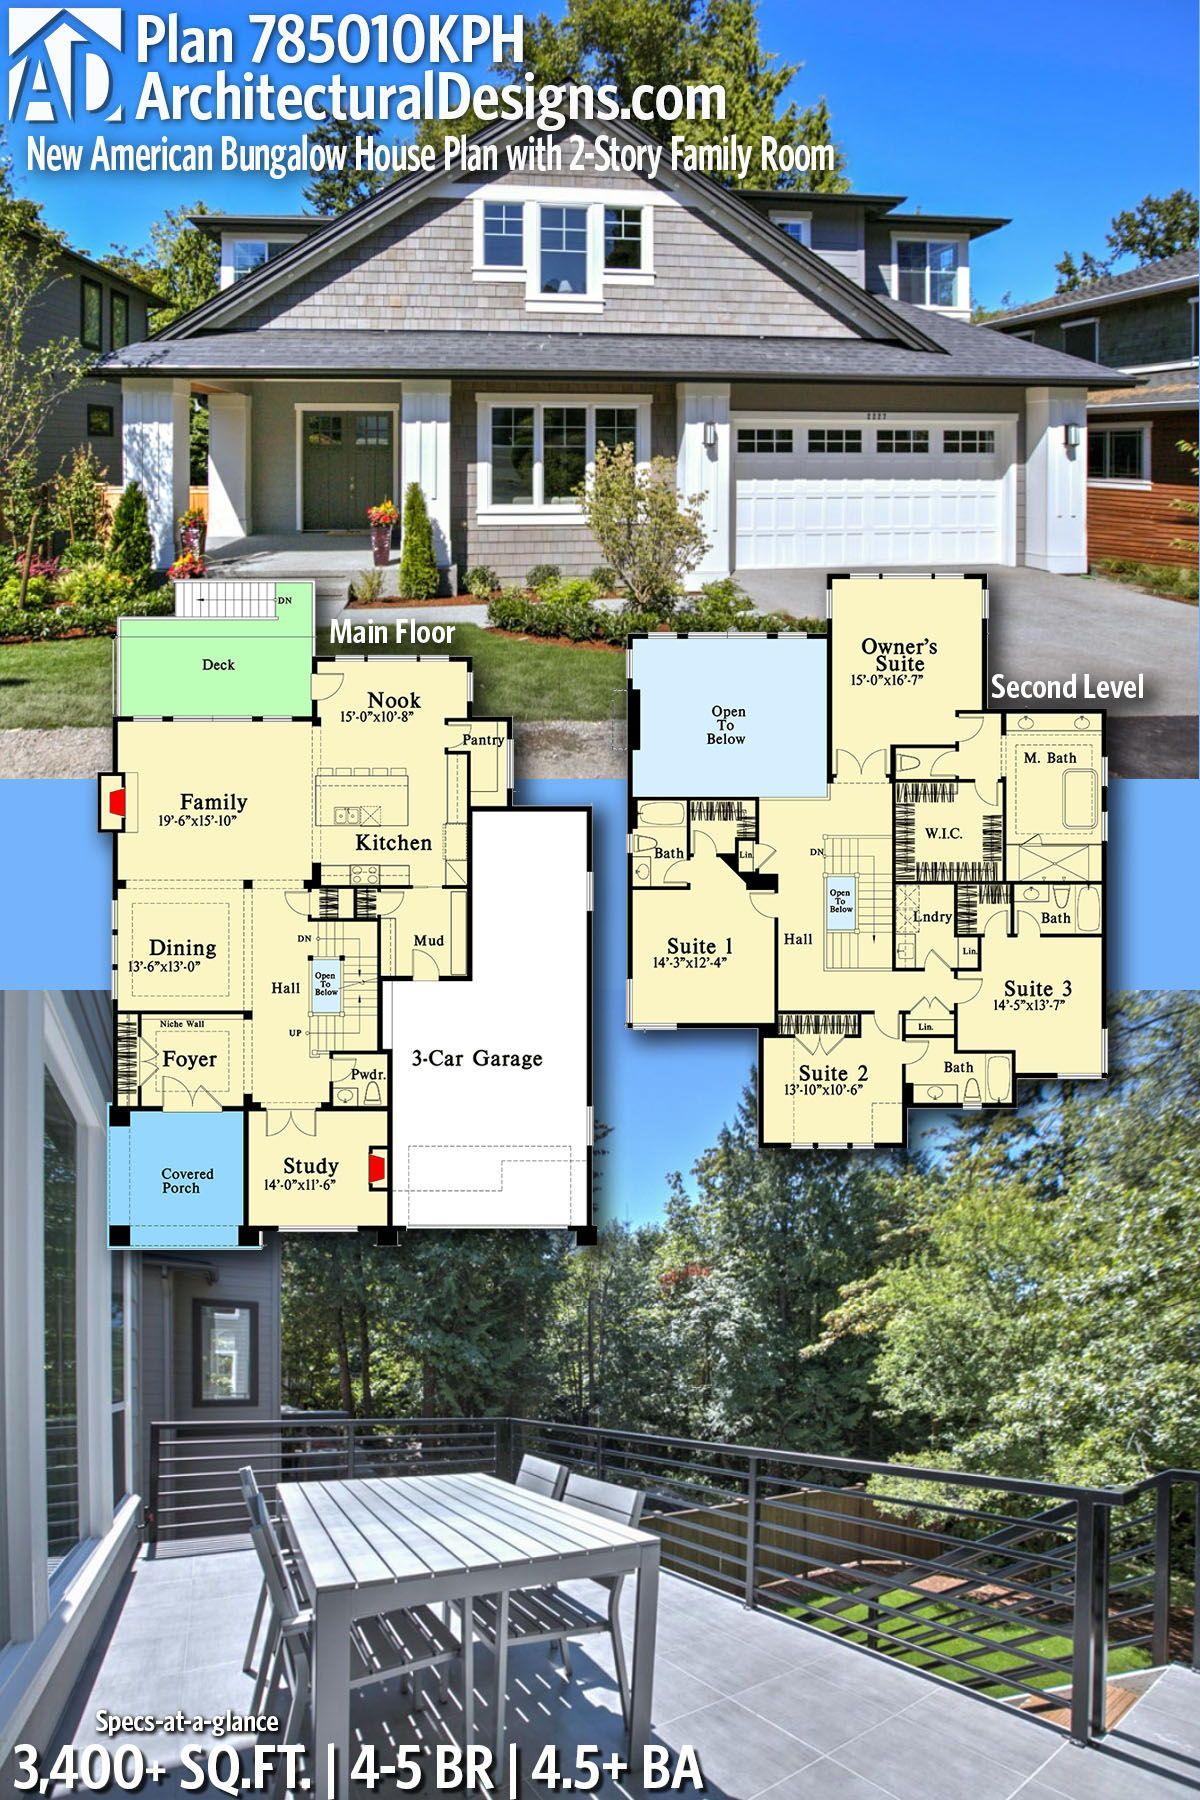 Pin By Jason Zaros On Home Reno Ideas In 2021 Bungalow House Plans House Plans Diy Tiny House Plans